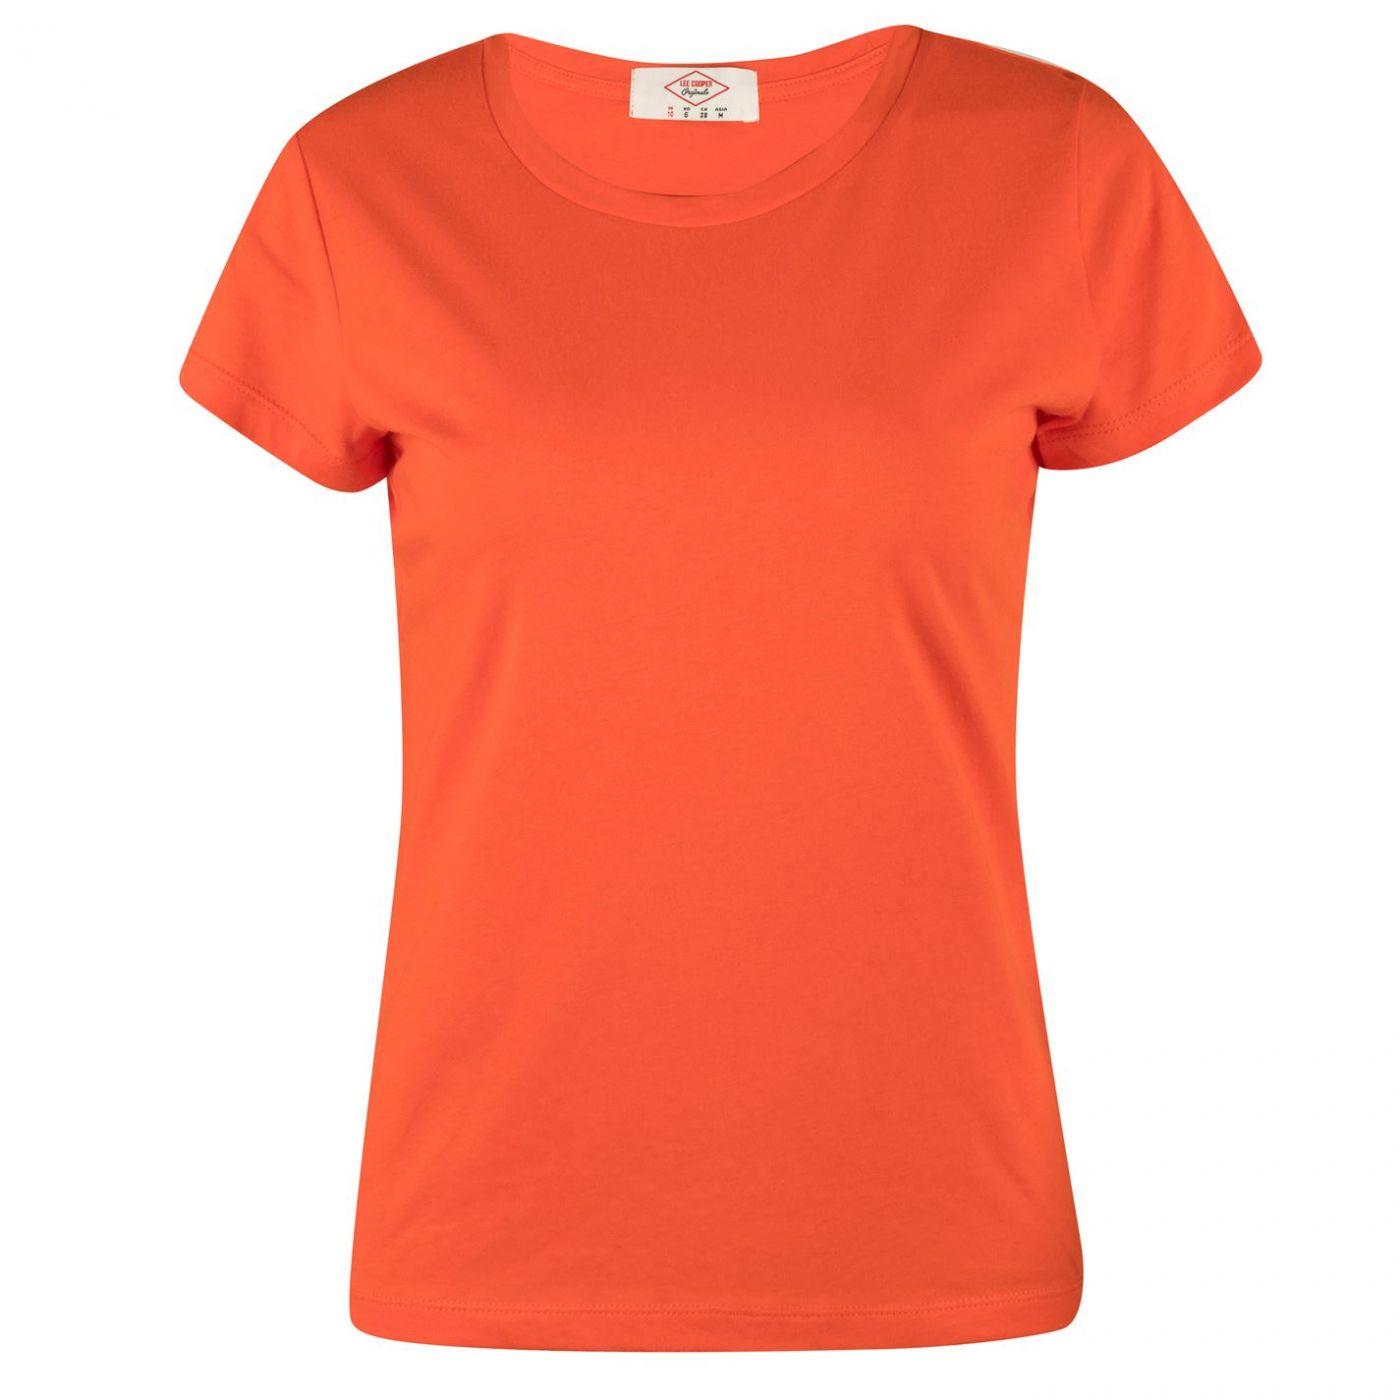 Lee Cooper Comb Cotton T Shirt Ladies